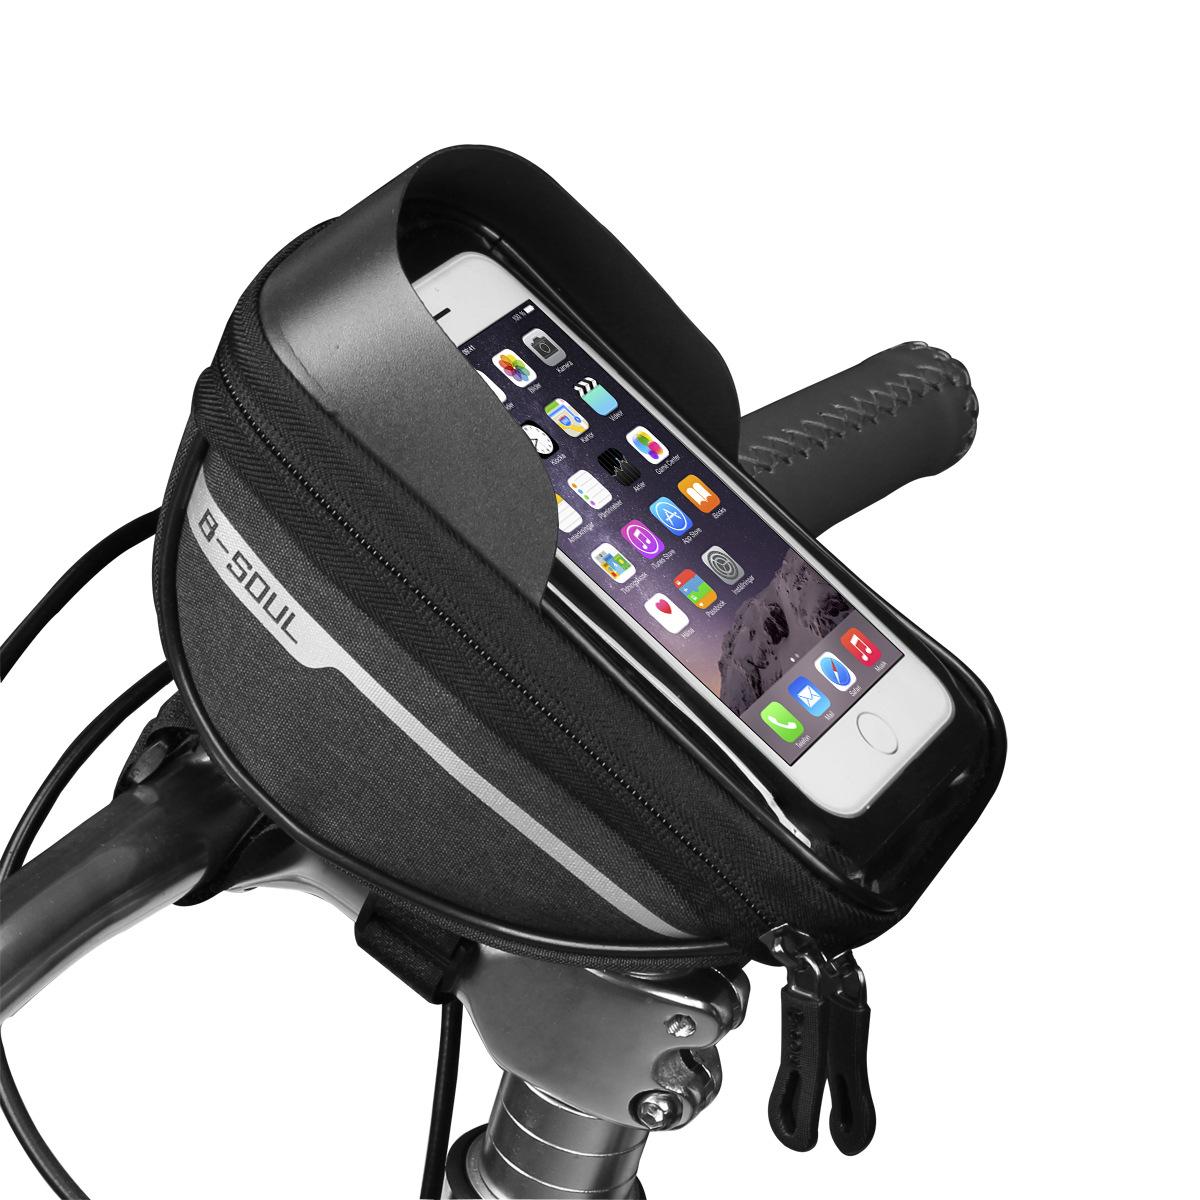 Pannier Bag Phone Holder For Bike Cycle Accessories Bike Side Bag Bike Phone Holder Waterproof Cycling Accessories Bike Accesories